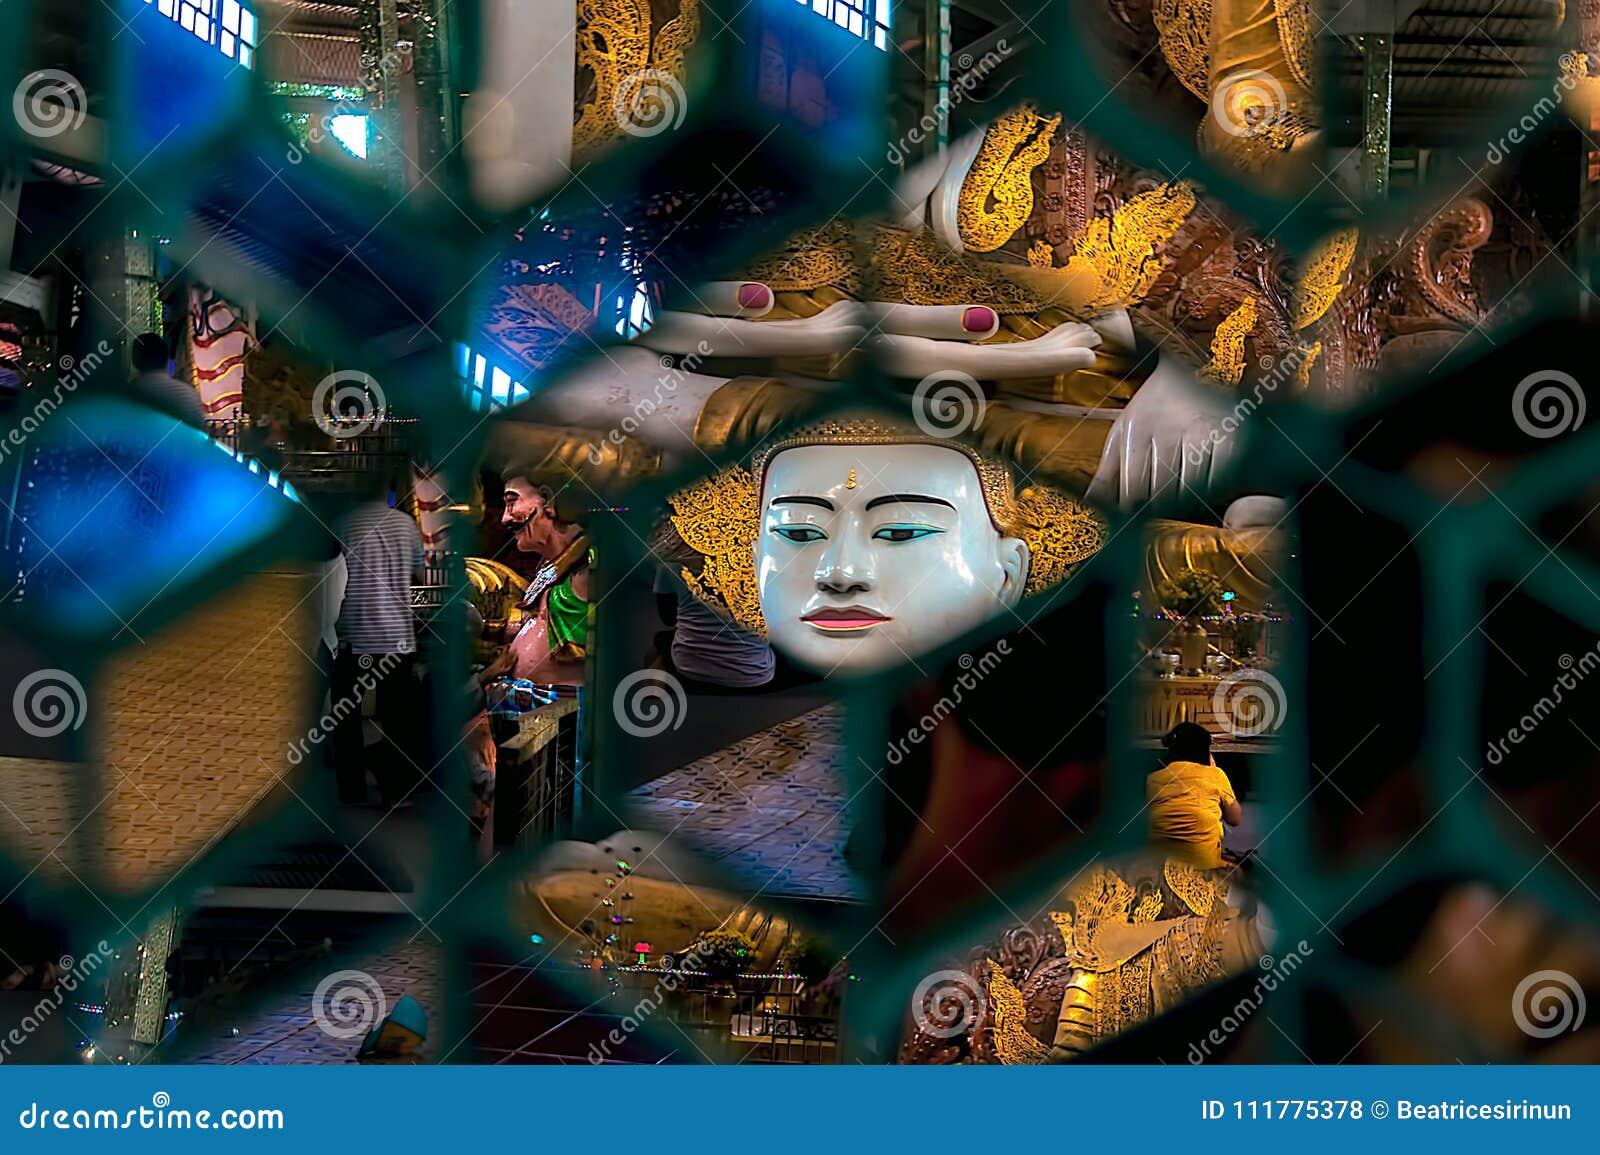 Kaleidoscope of The Lord Buddha.